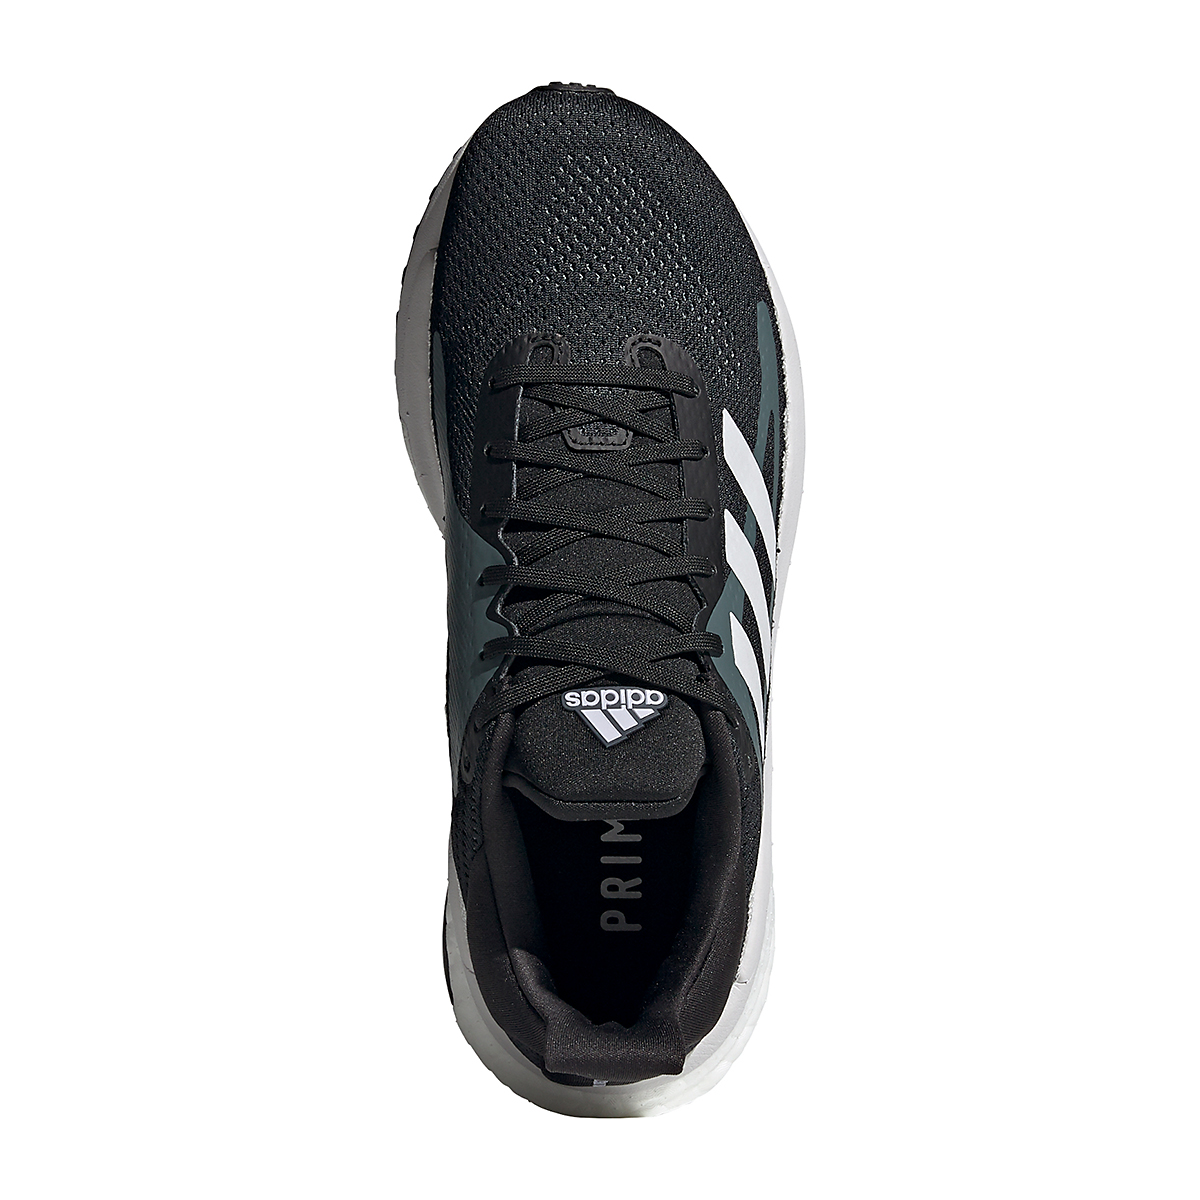 Women's Adidas Solar Glide ST 3 Running Shoe - Color: Core Black - Size: 5 - Width: Regular, Core Black, large, image 6